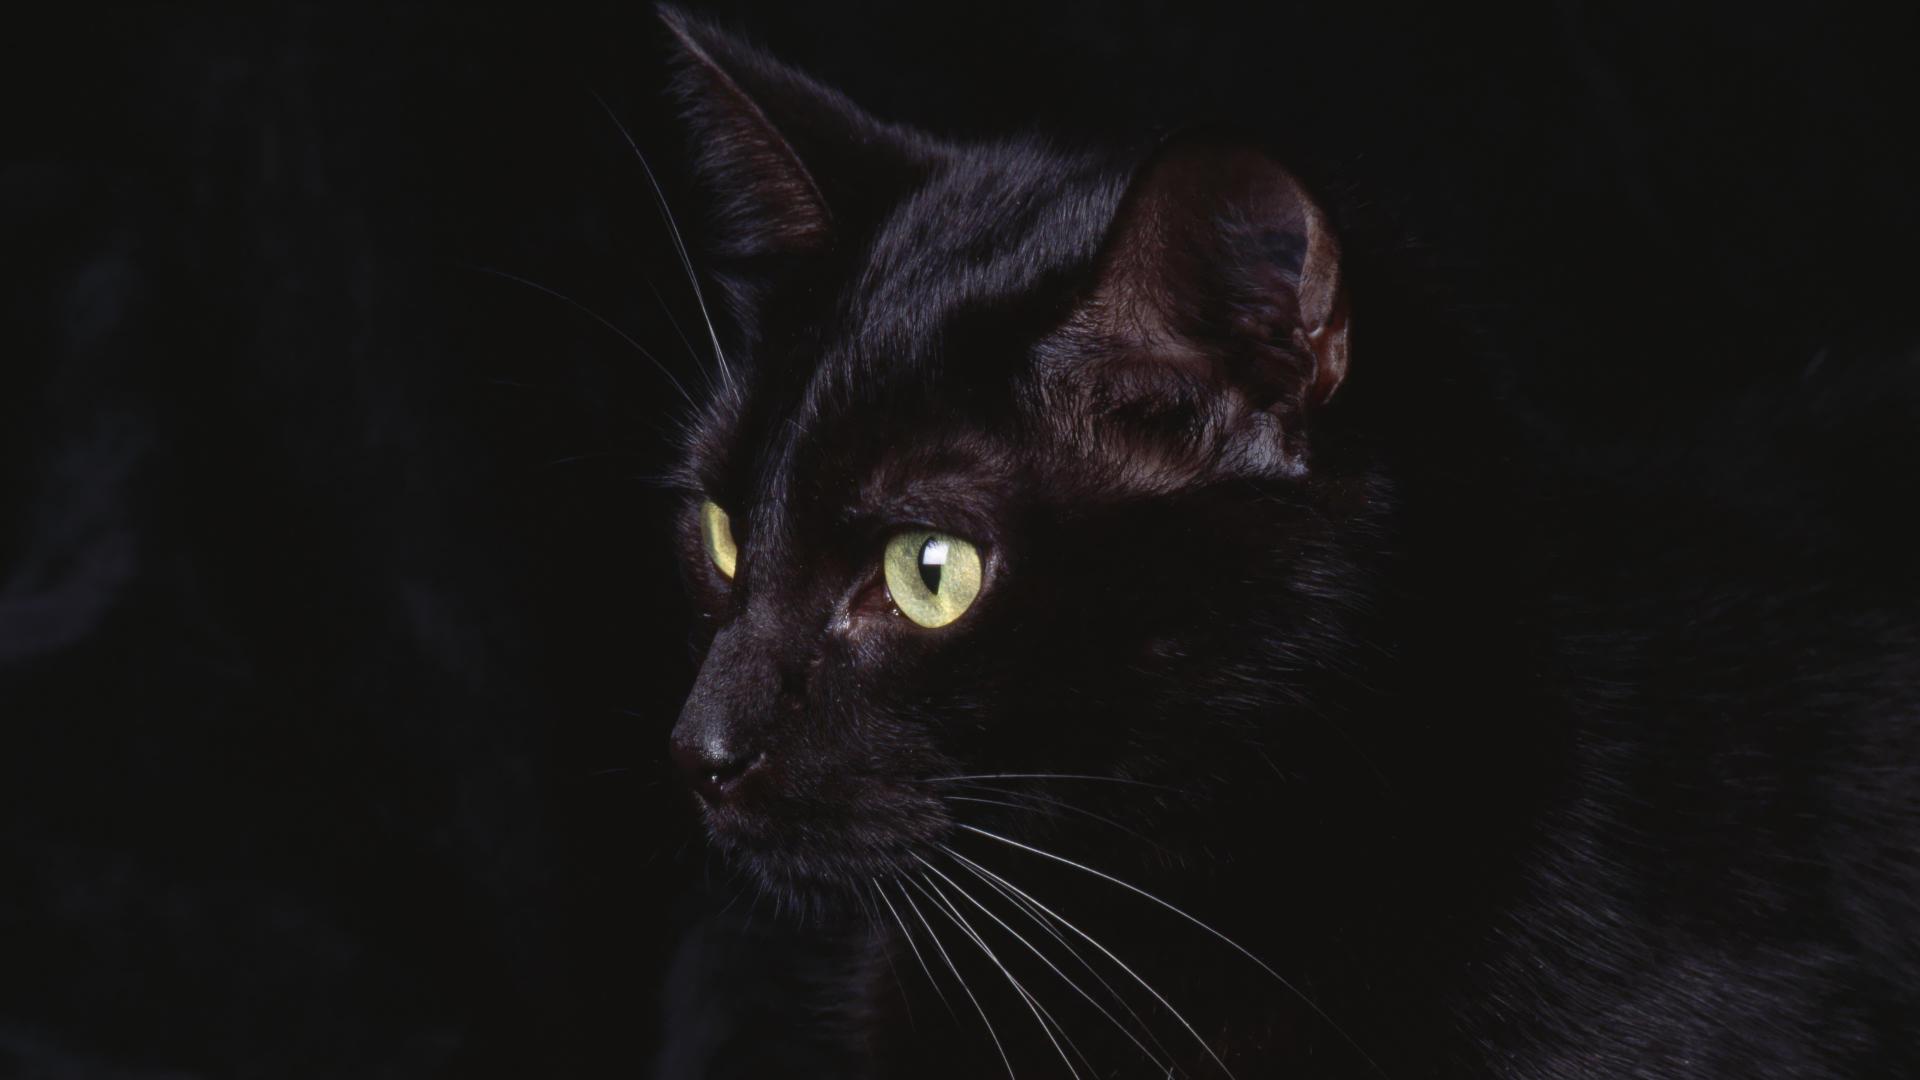 Black Cat In The Dark Hd Wallpaper